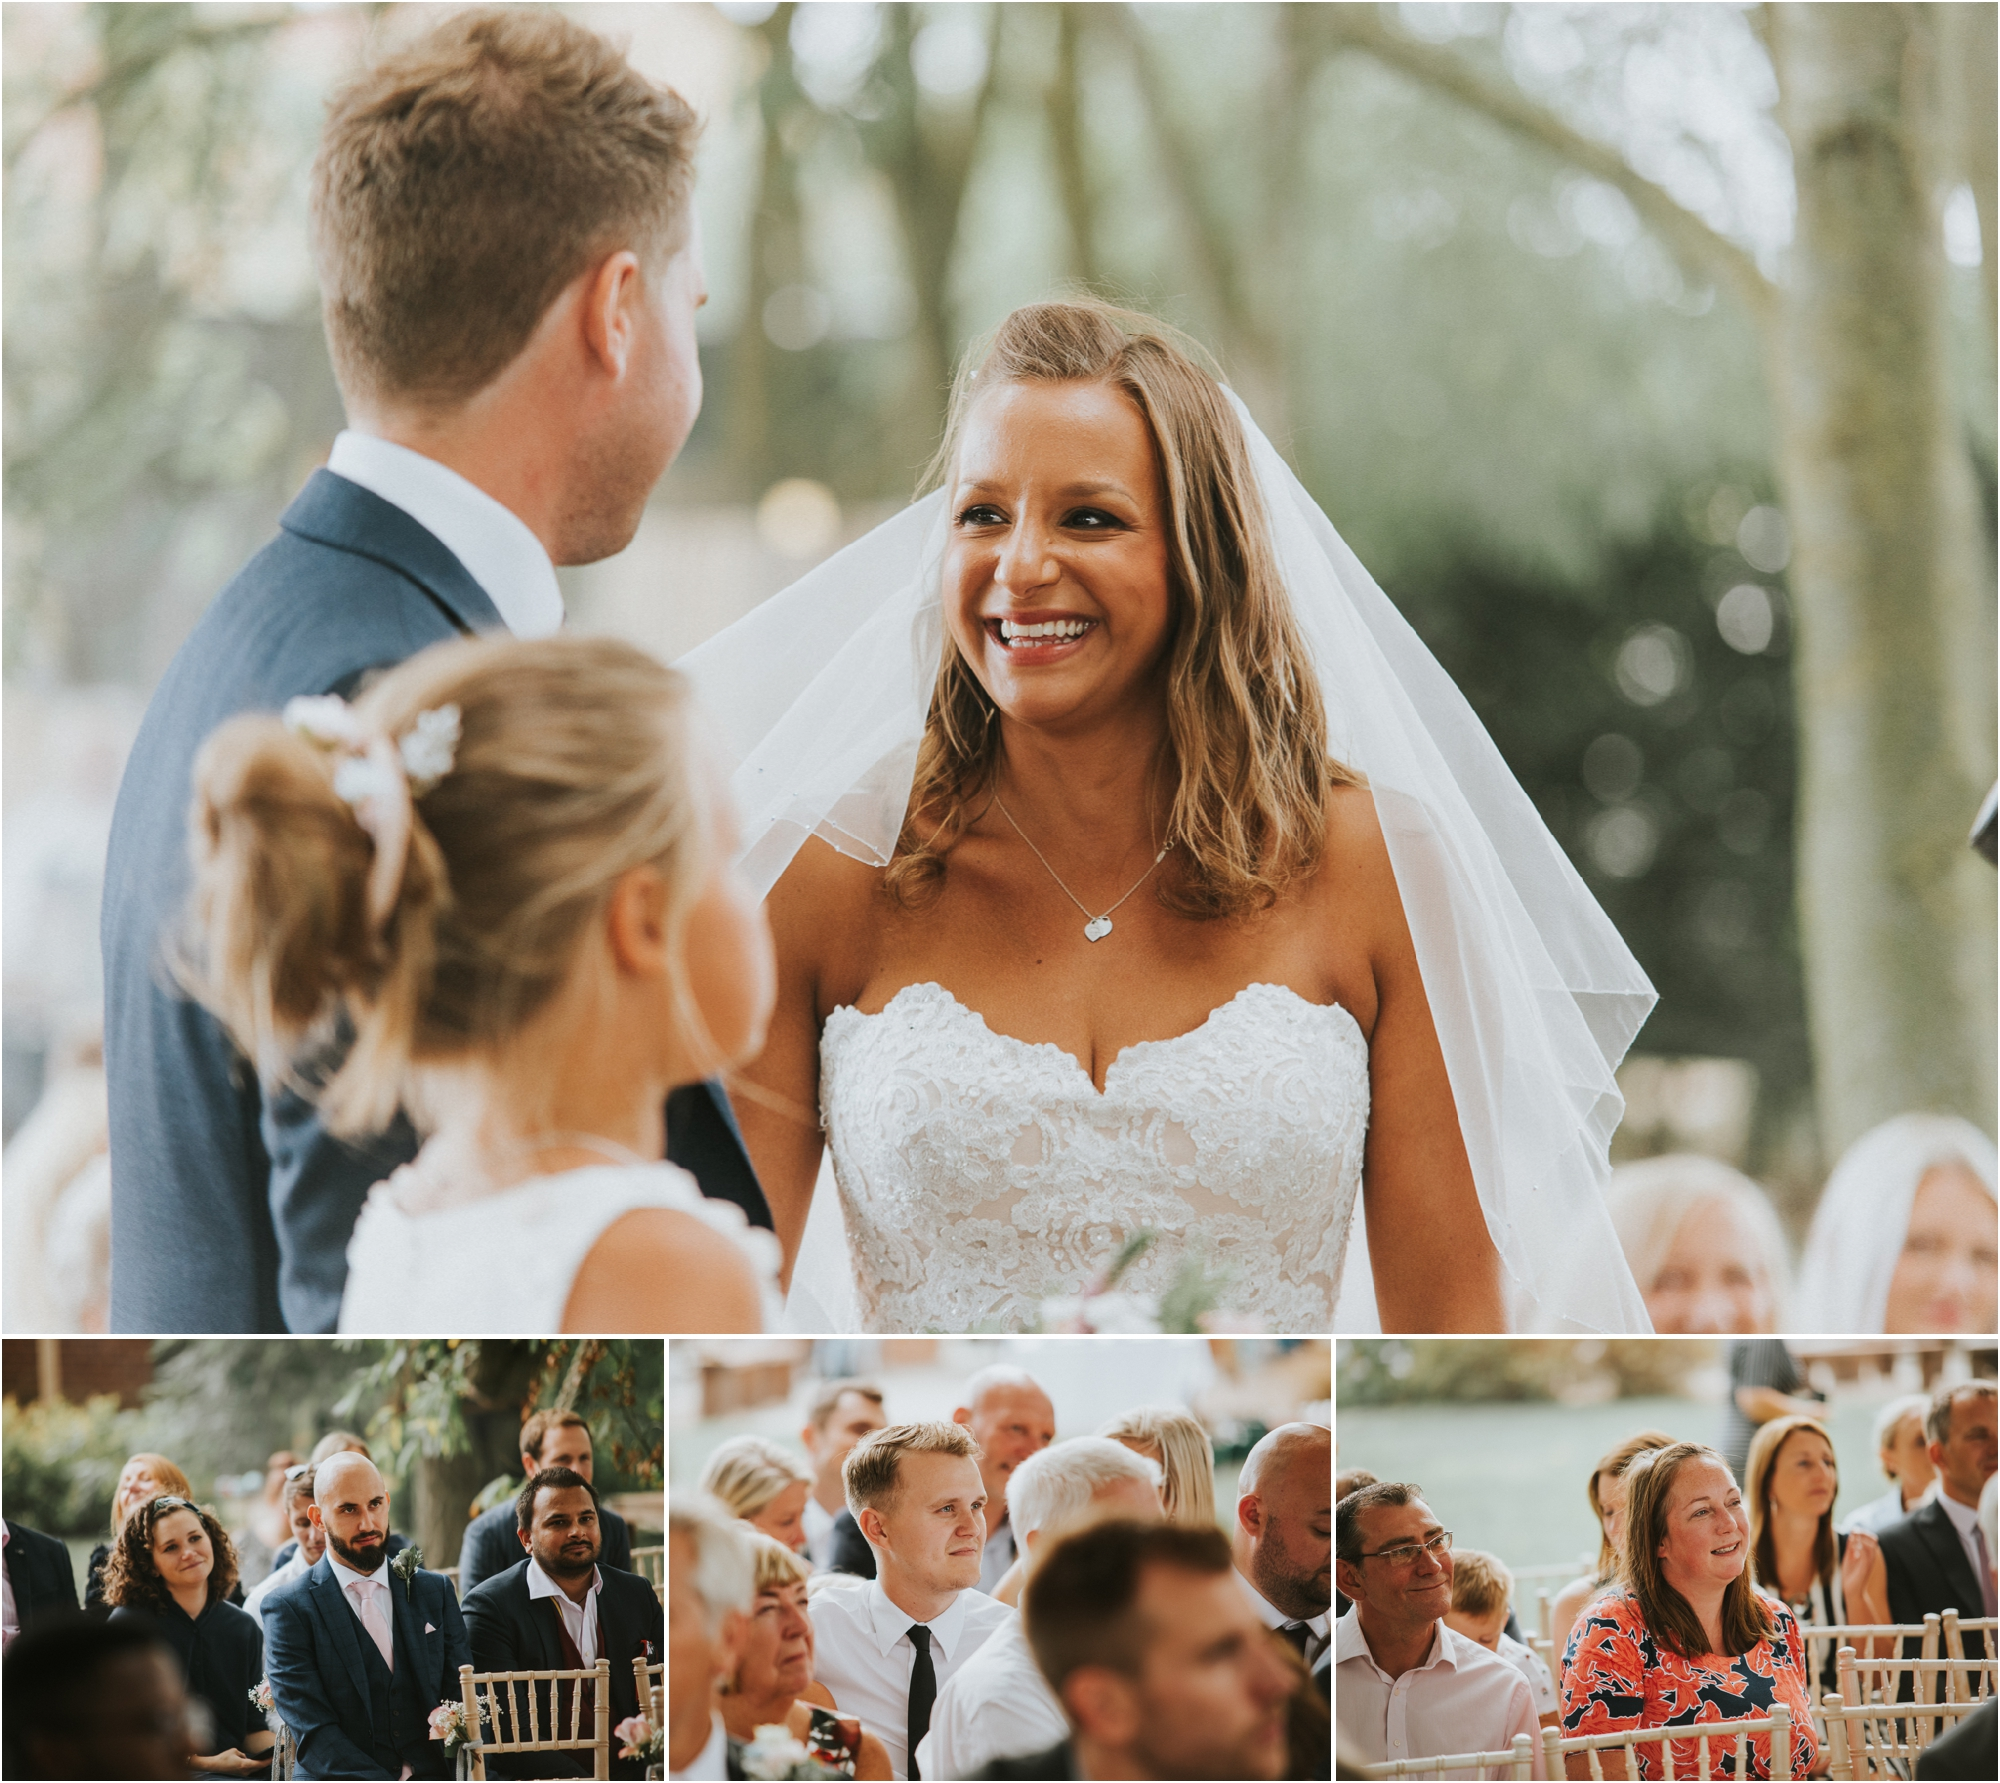 PheasantBrewery-LukeHolroyd-Yorkshirewedding_000107.jpg